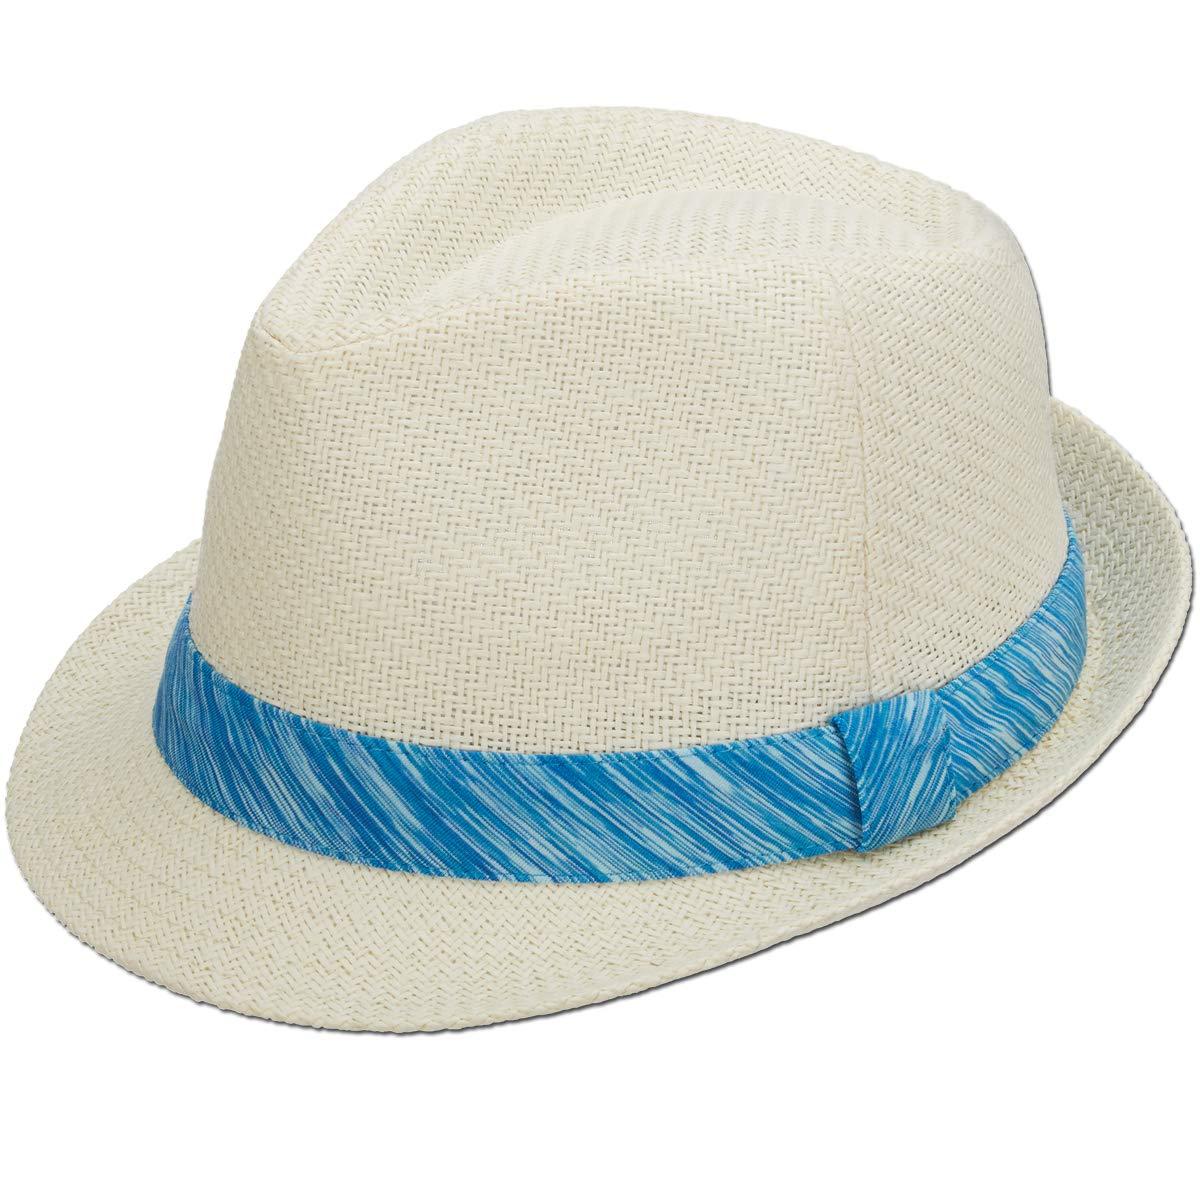 Panama Jack Women's Fedora Hat - Lightweight Matte Toyo Straw, 1 3/4'' Structured Brim, Knit Ribbon Hat Band (Turquoise)